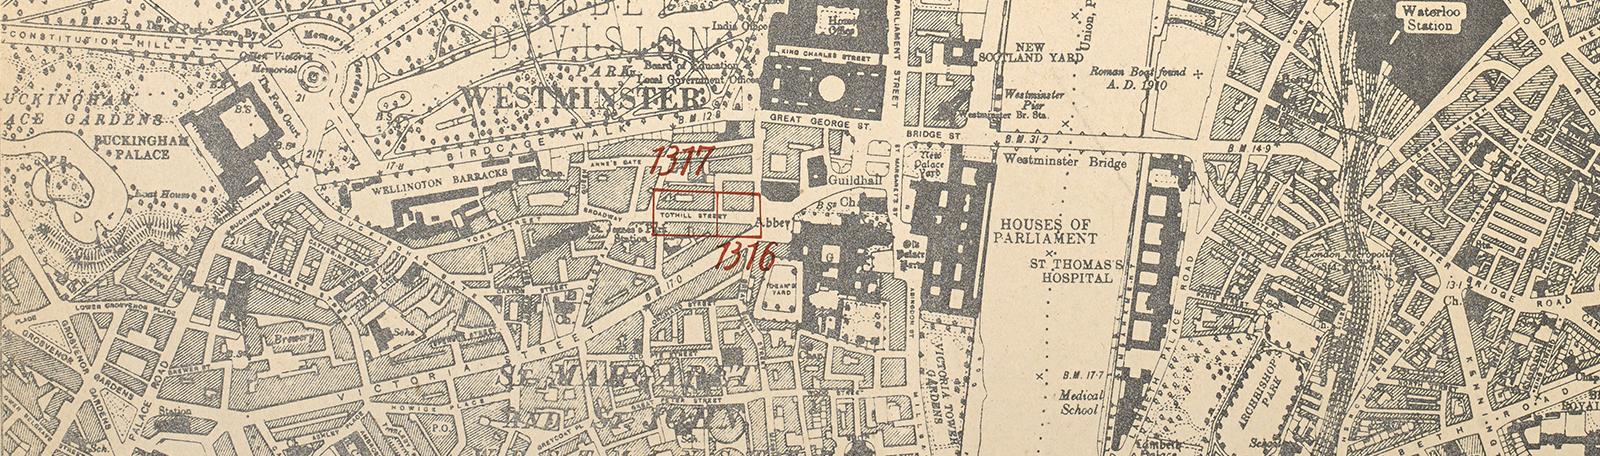 20th century London maps banner - London Mayfair Square (CC.5.a.555.)